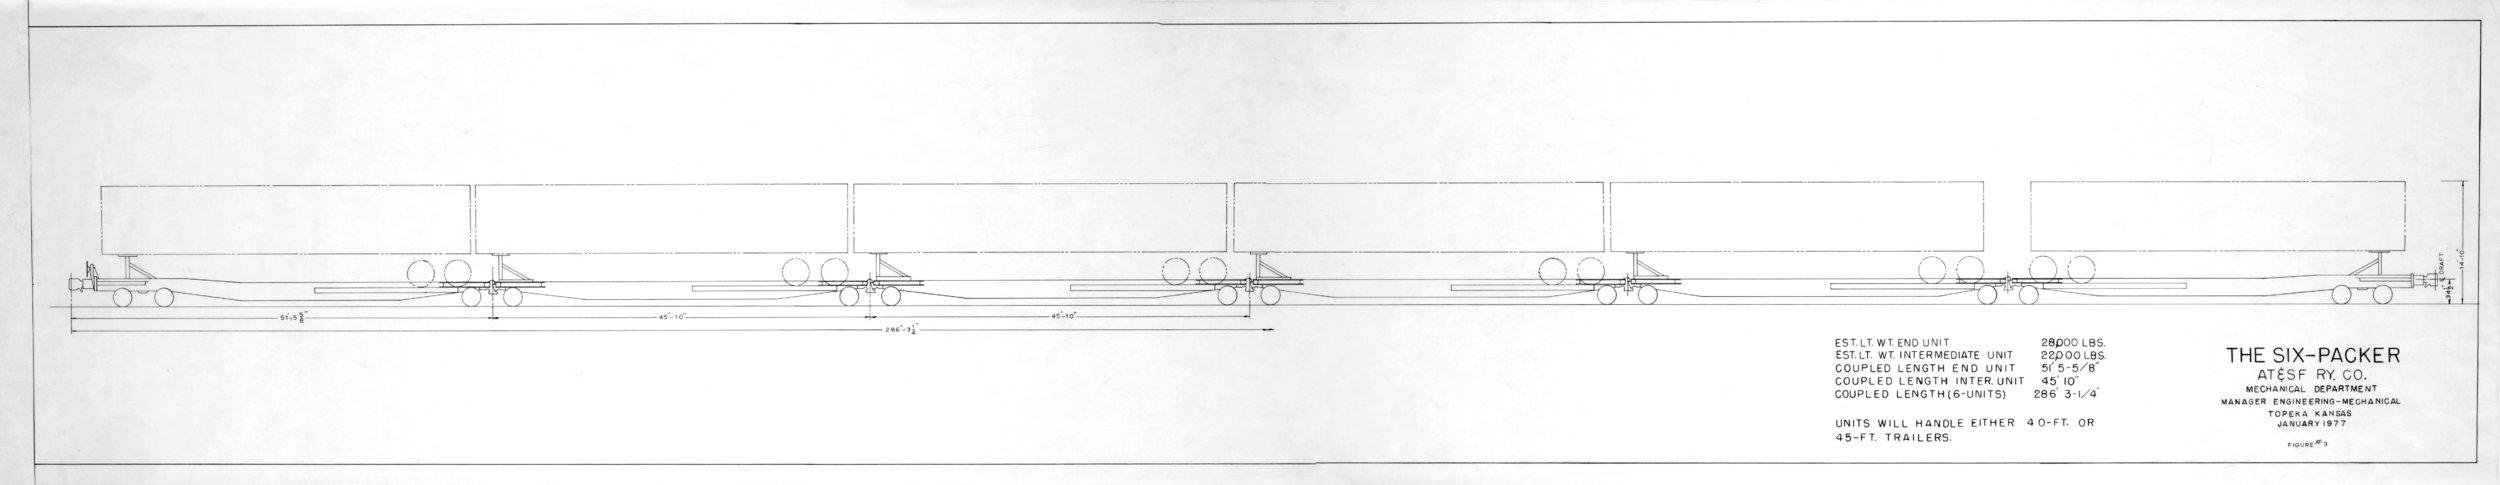 Atchison, Topeka & Santa Fe Railway Company's six packer